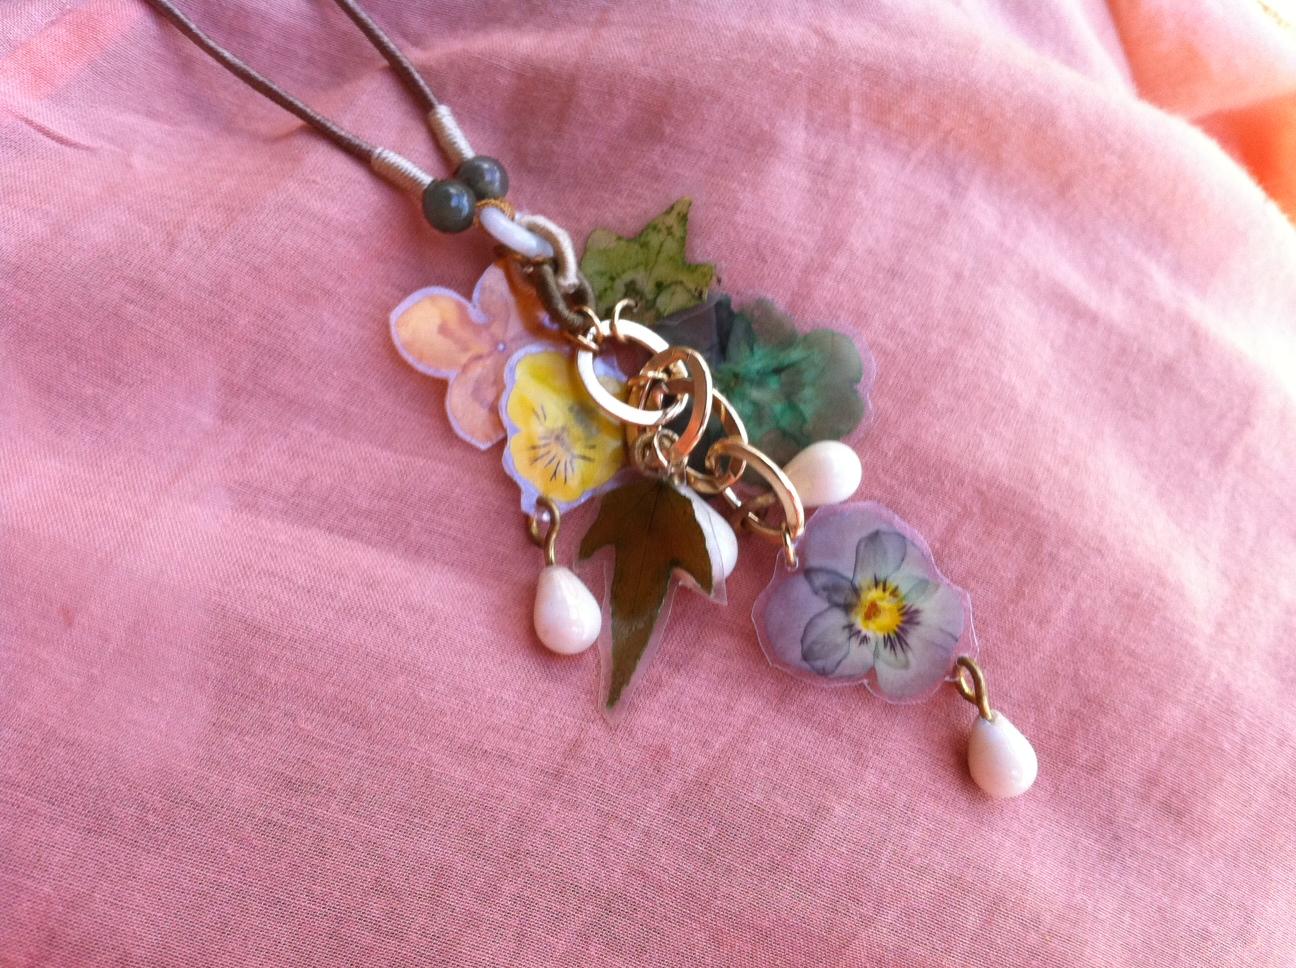 Bondville Kula Jungle pressed flower jewelry